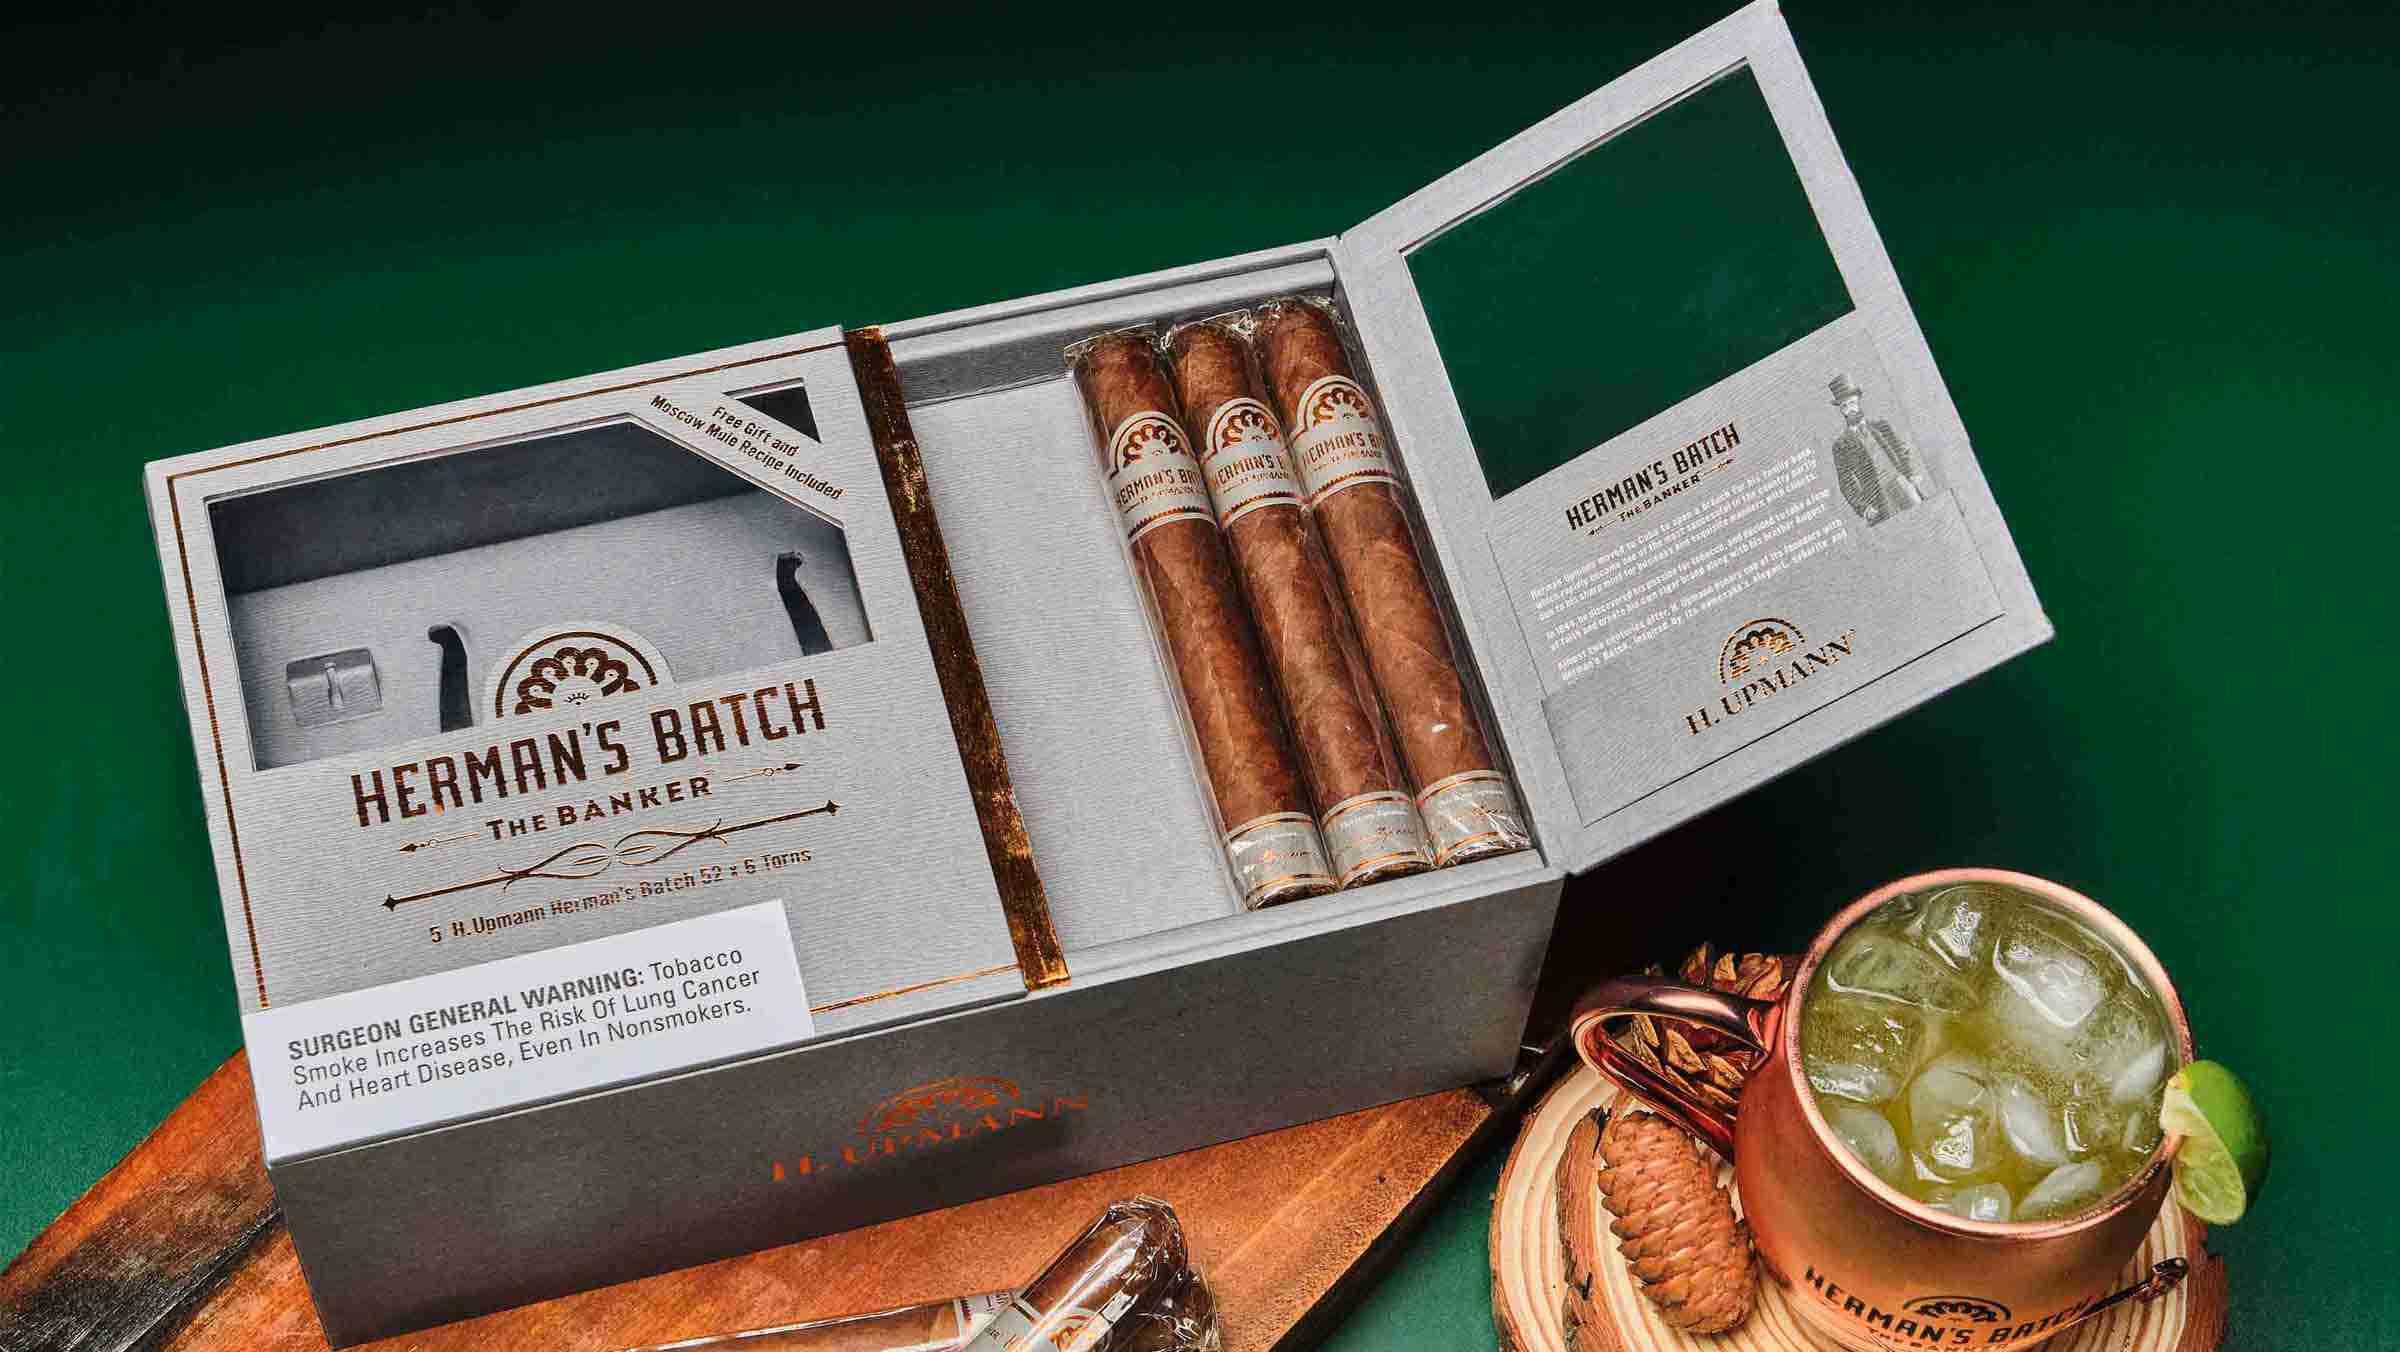 H. Upmann Herman's Batch Cigar Set